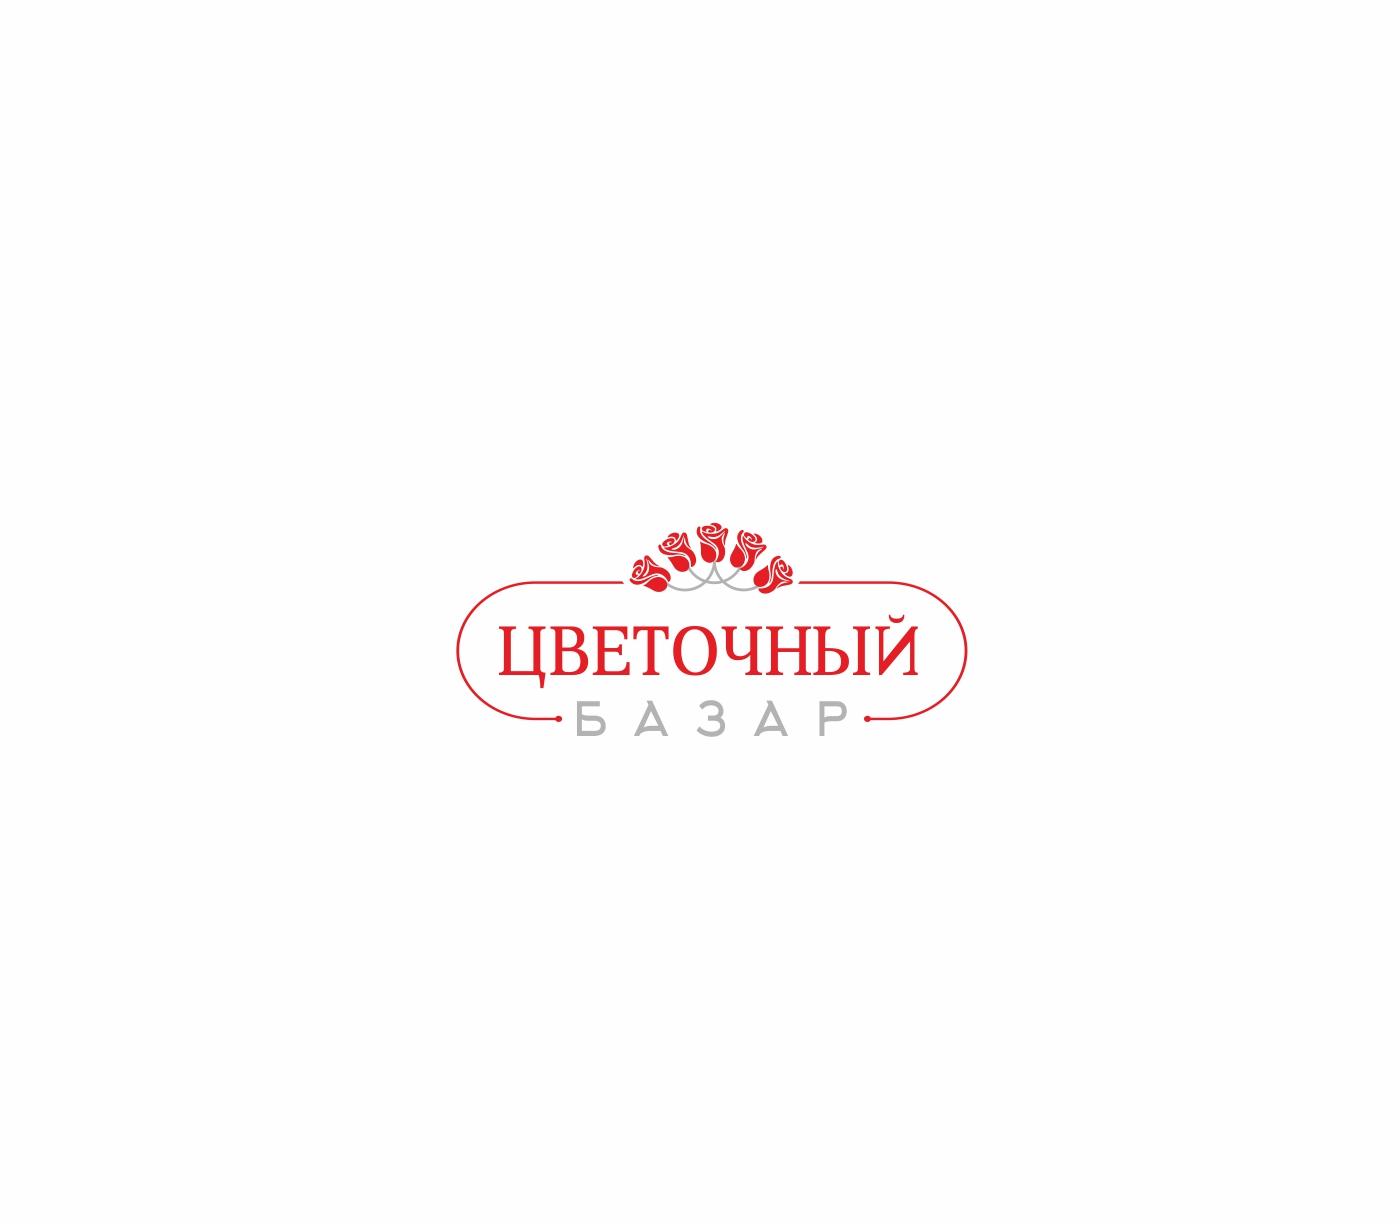 Разработка фирменного стиля для цветочного салона фото f_9185c3351b8459b0.jpg